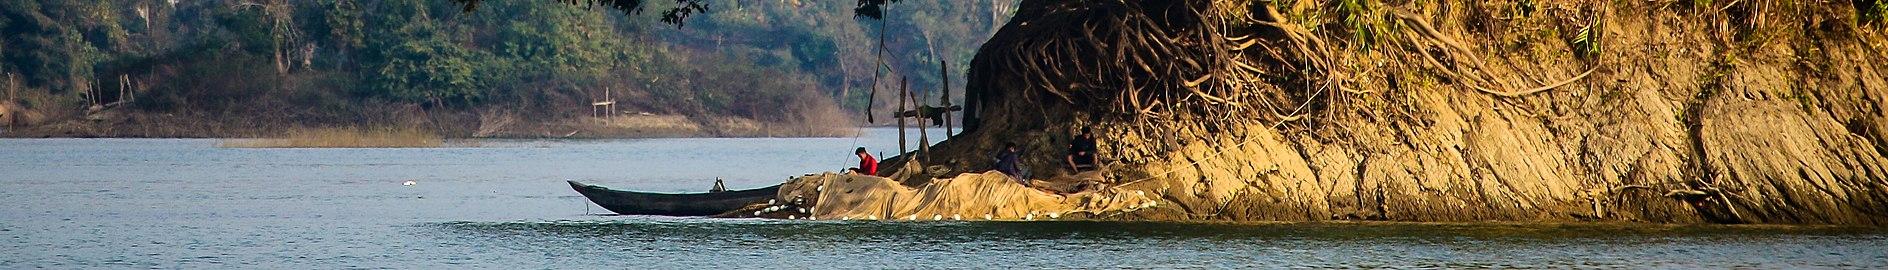 Kaptai lake beauty (cropped).jpg